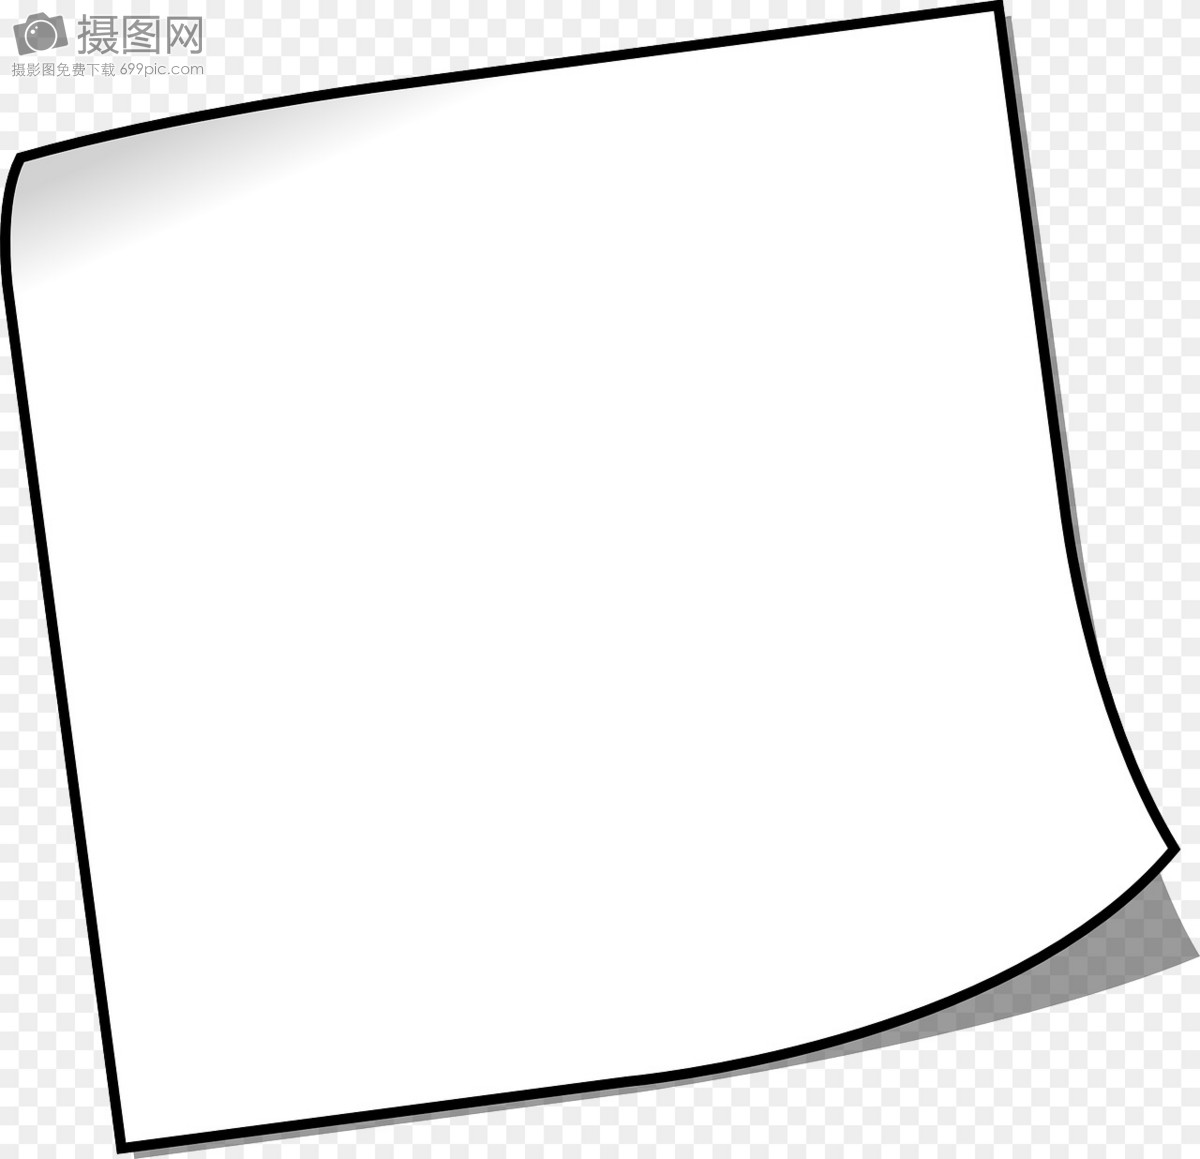 ppt 背景 背景图片 边框 模板 设计 相框 1200_1159